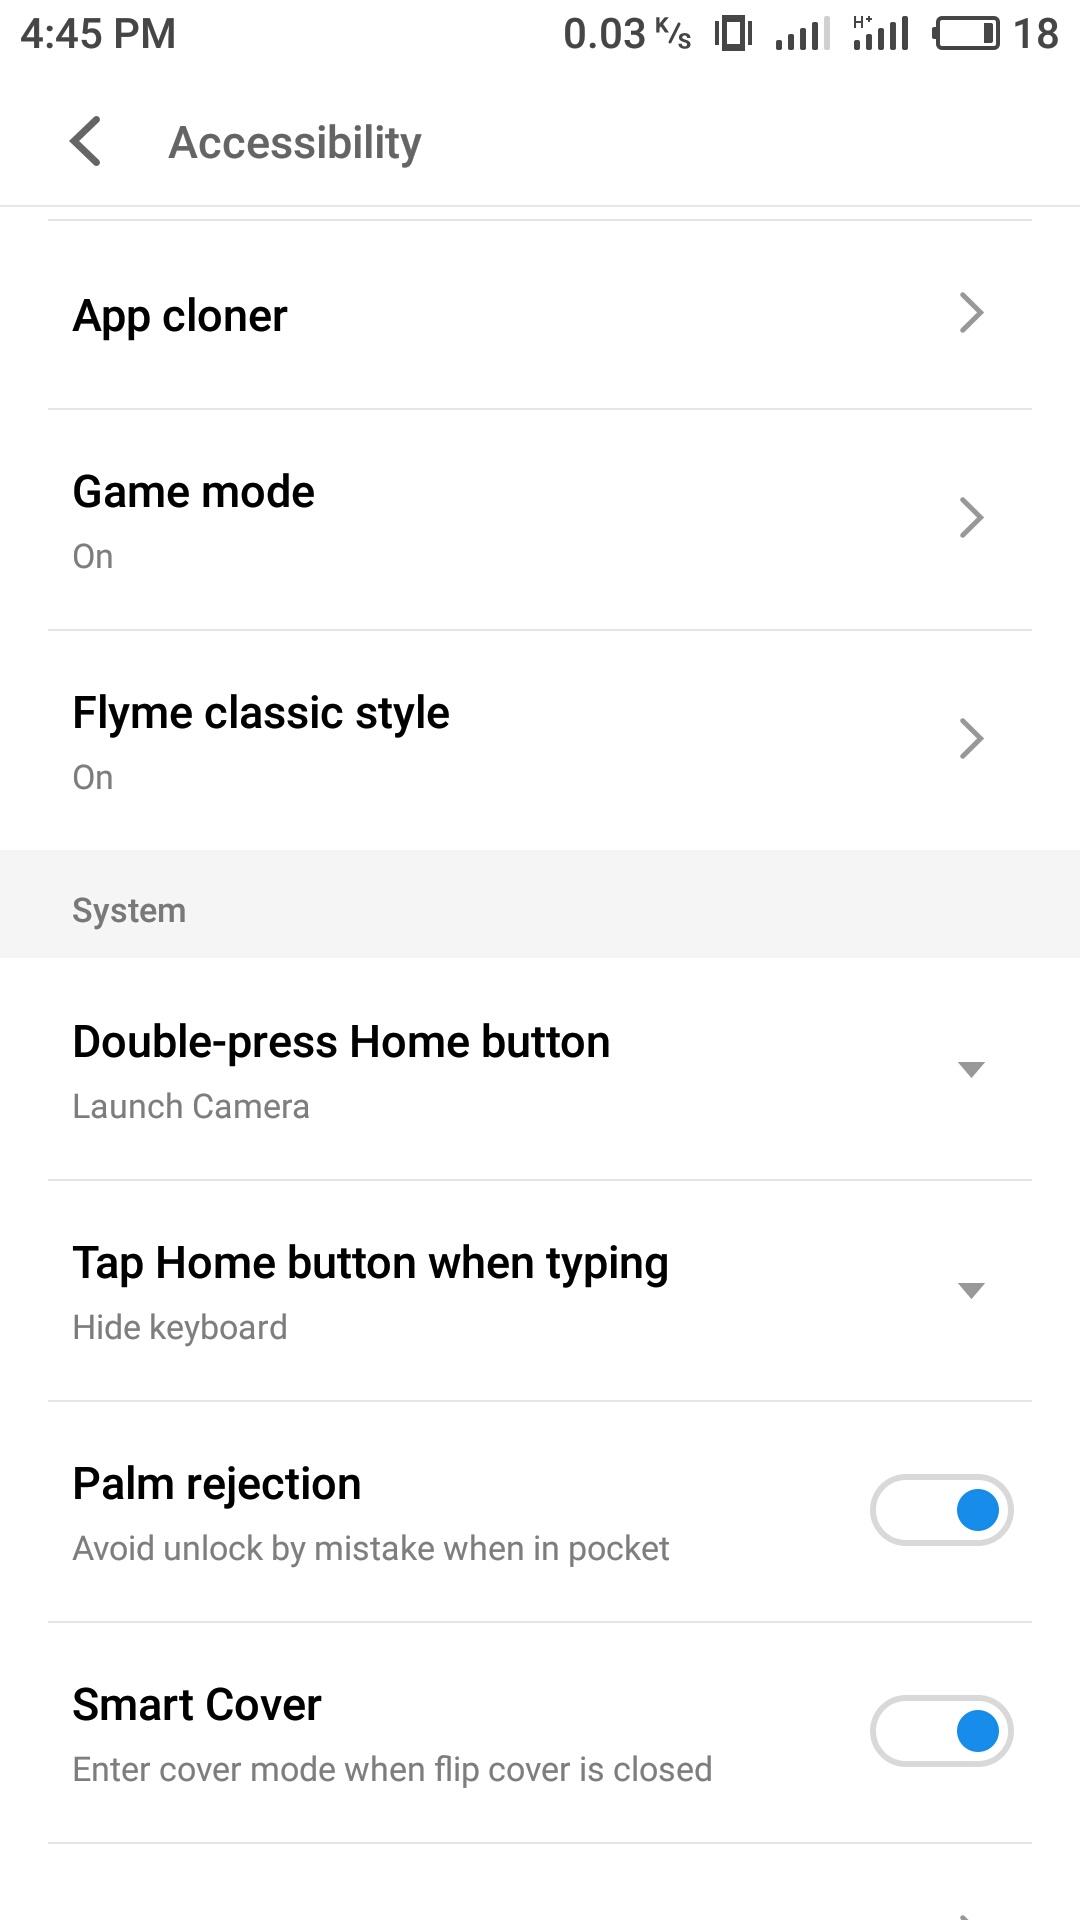 App Clone Smart Cover.jpg App Clone 2.jpg